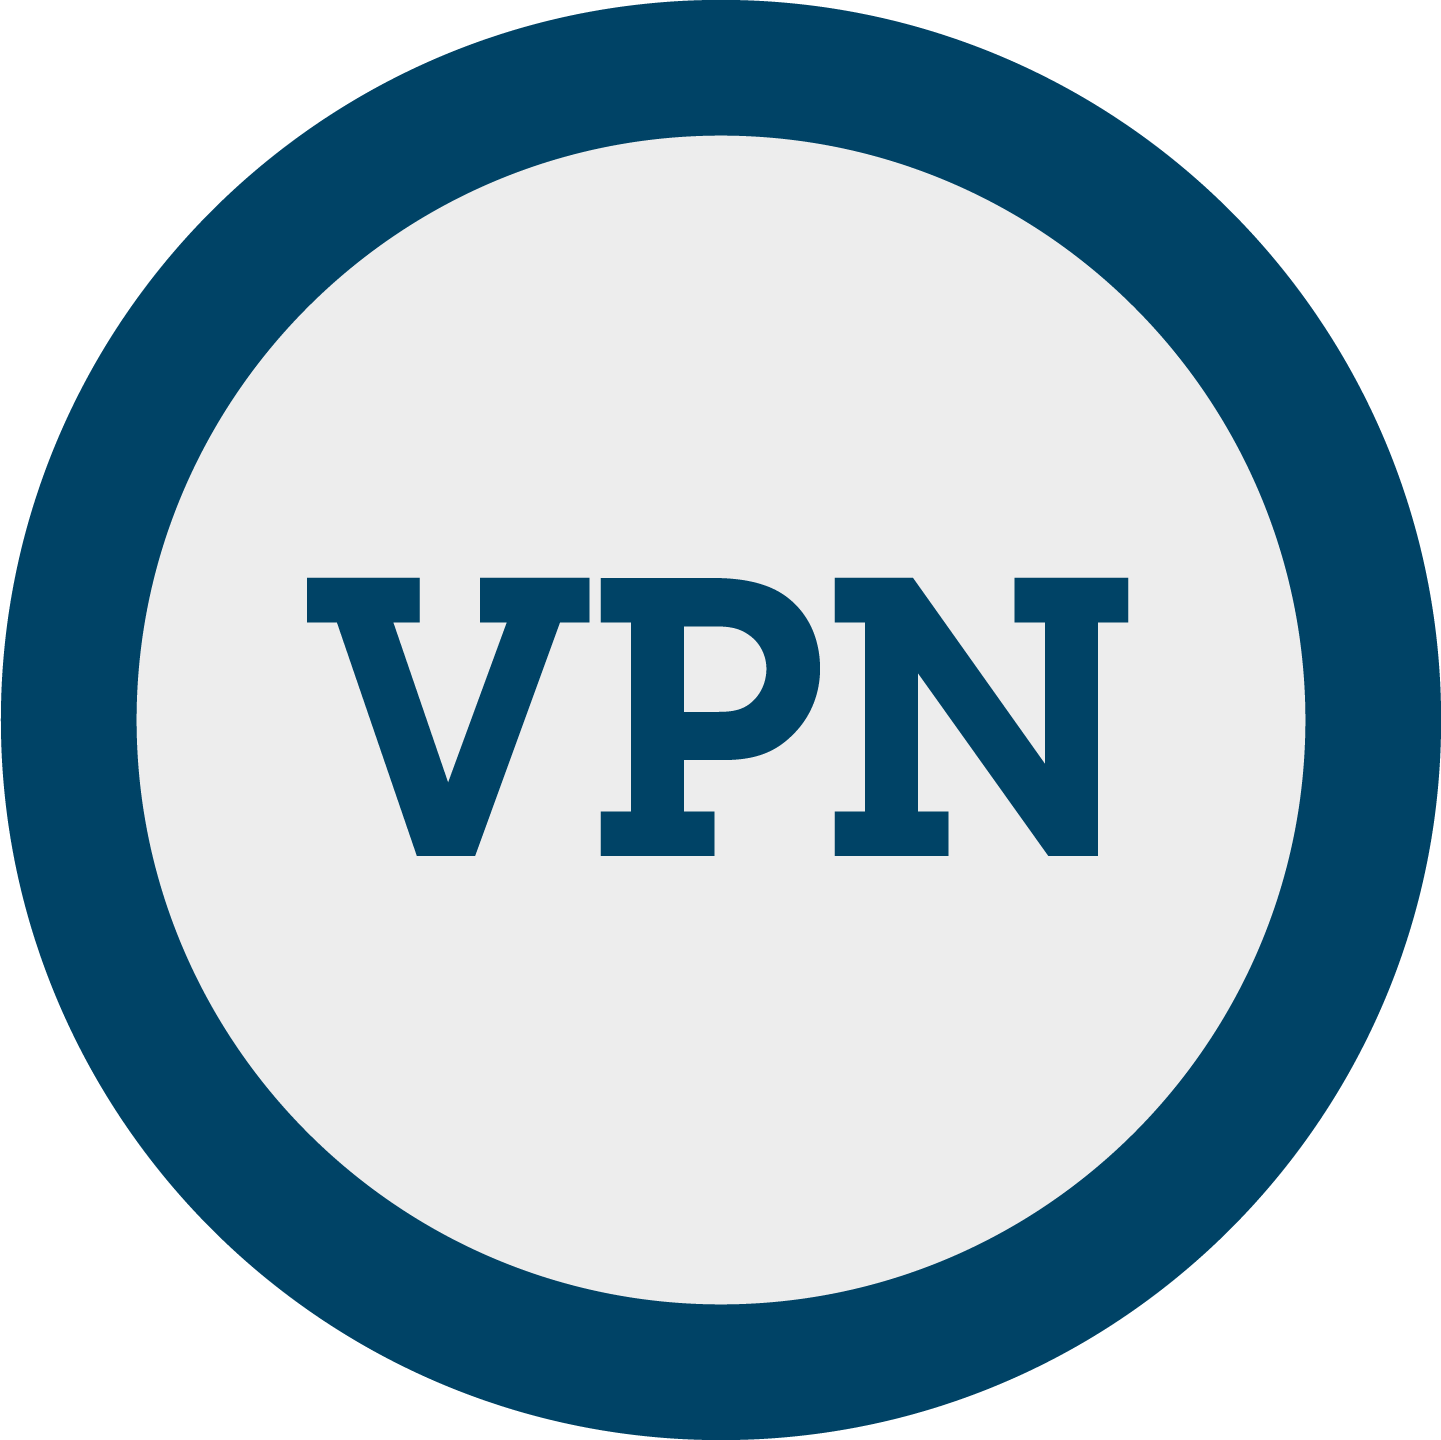 jak działa VPN